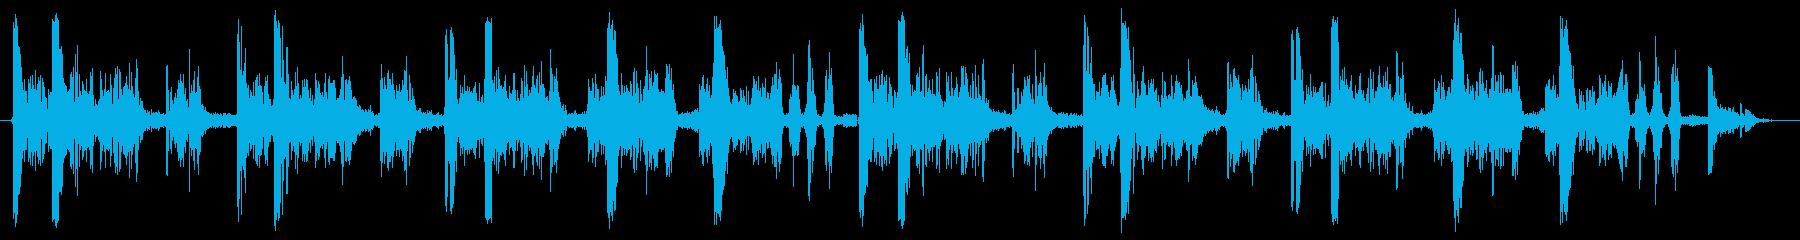 Legionary Drums P...の再生済みの波形